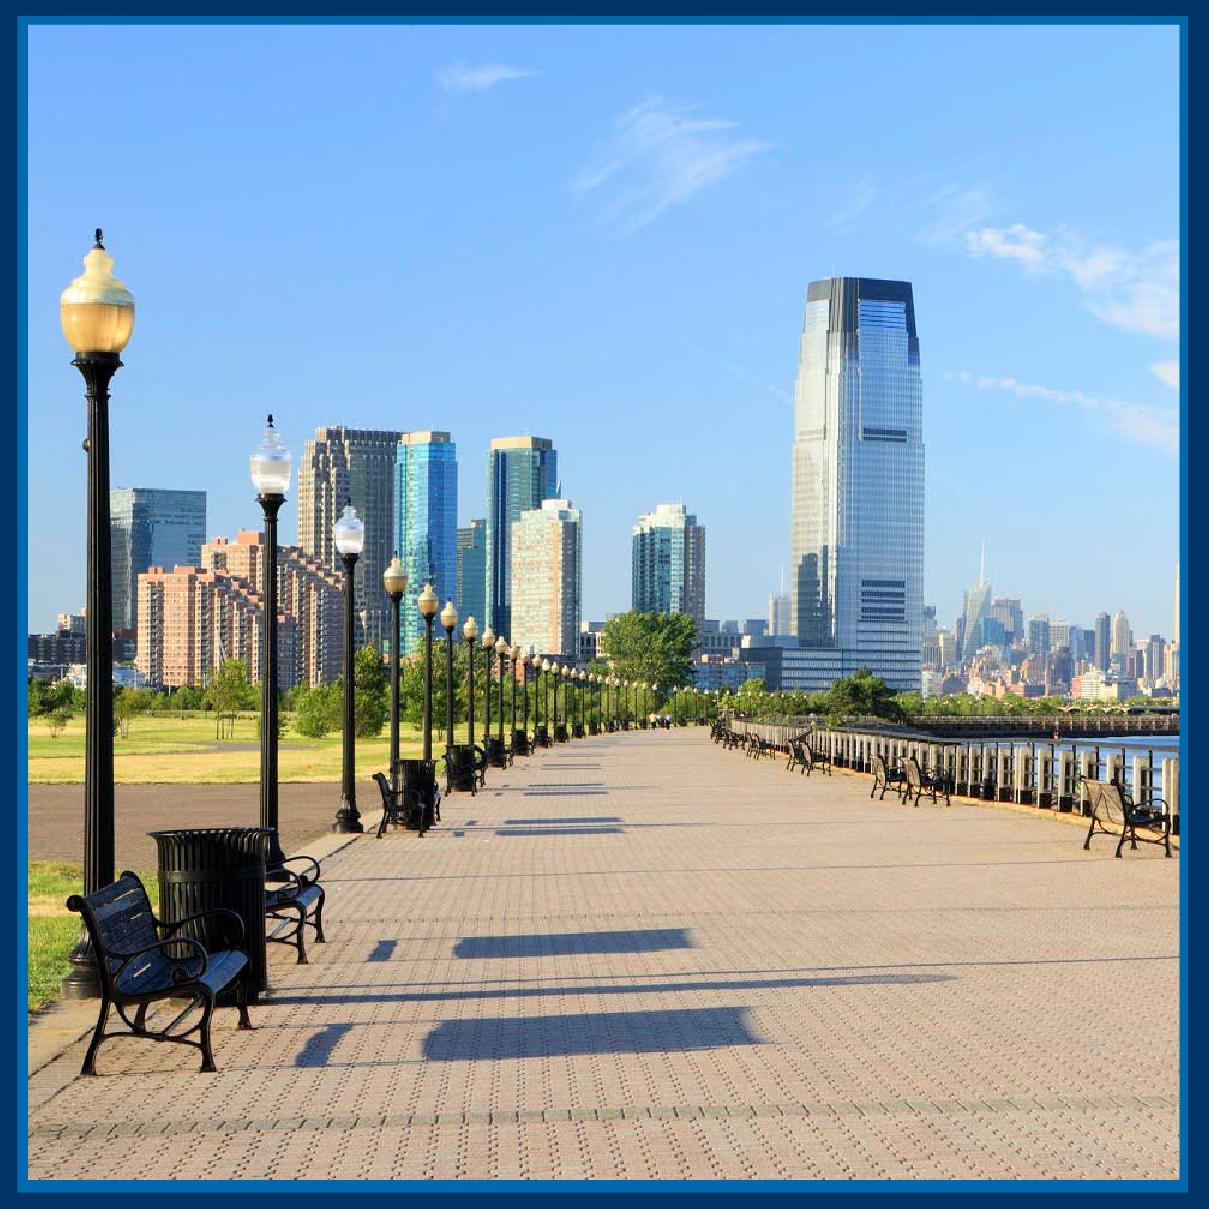 New Jersey Mortgage Loans, NJ Mortgage Loans, NJ Mortgage Brokers